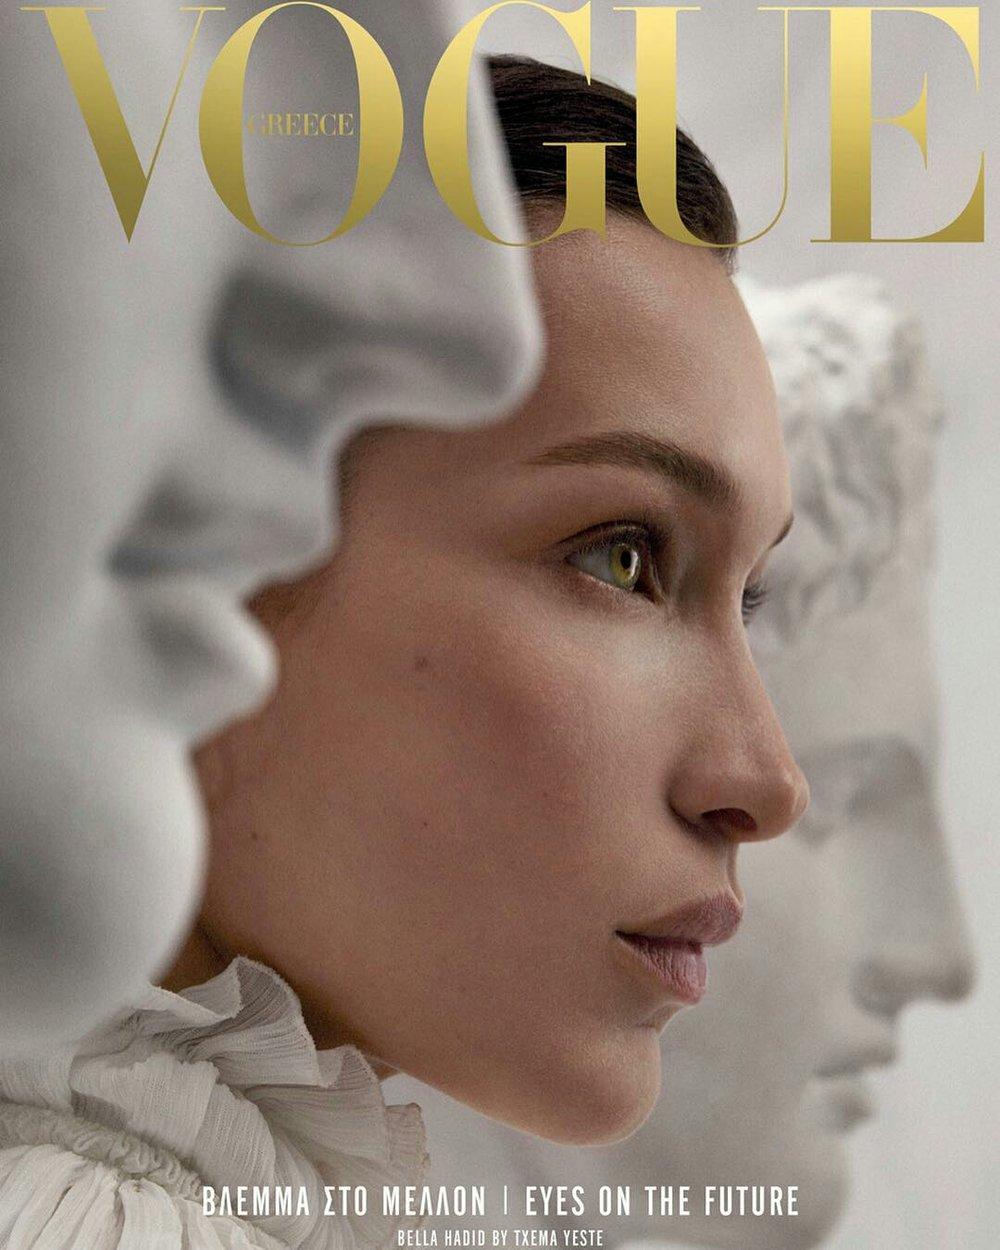 Bella-Hadid-by-Txema-Yeste-Vogue-Greece-April-2019-+(1).jpg